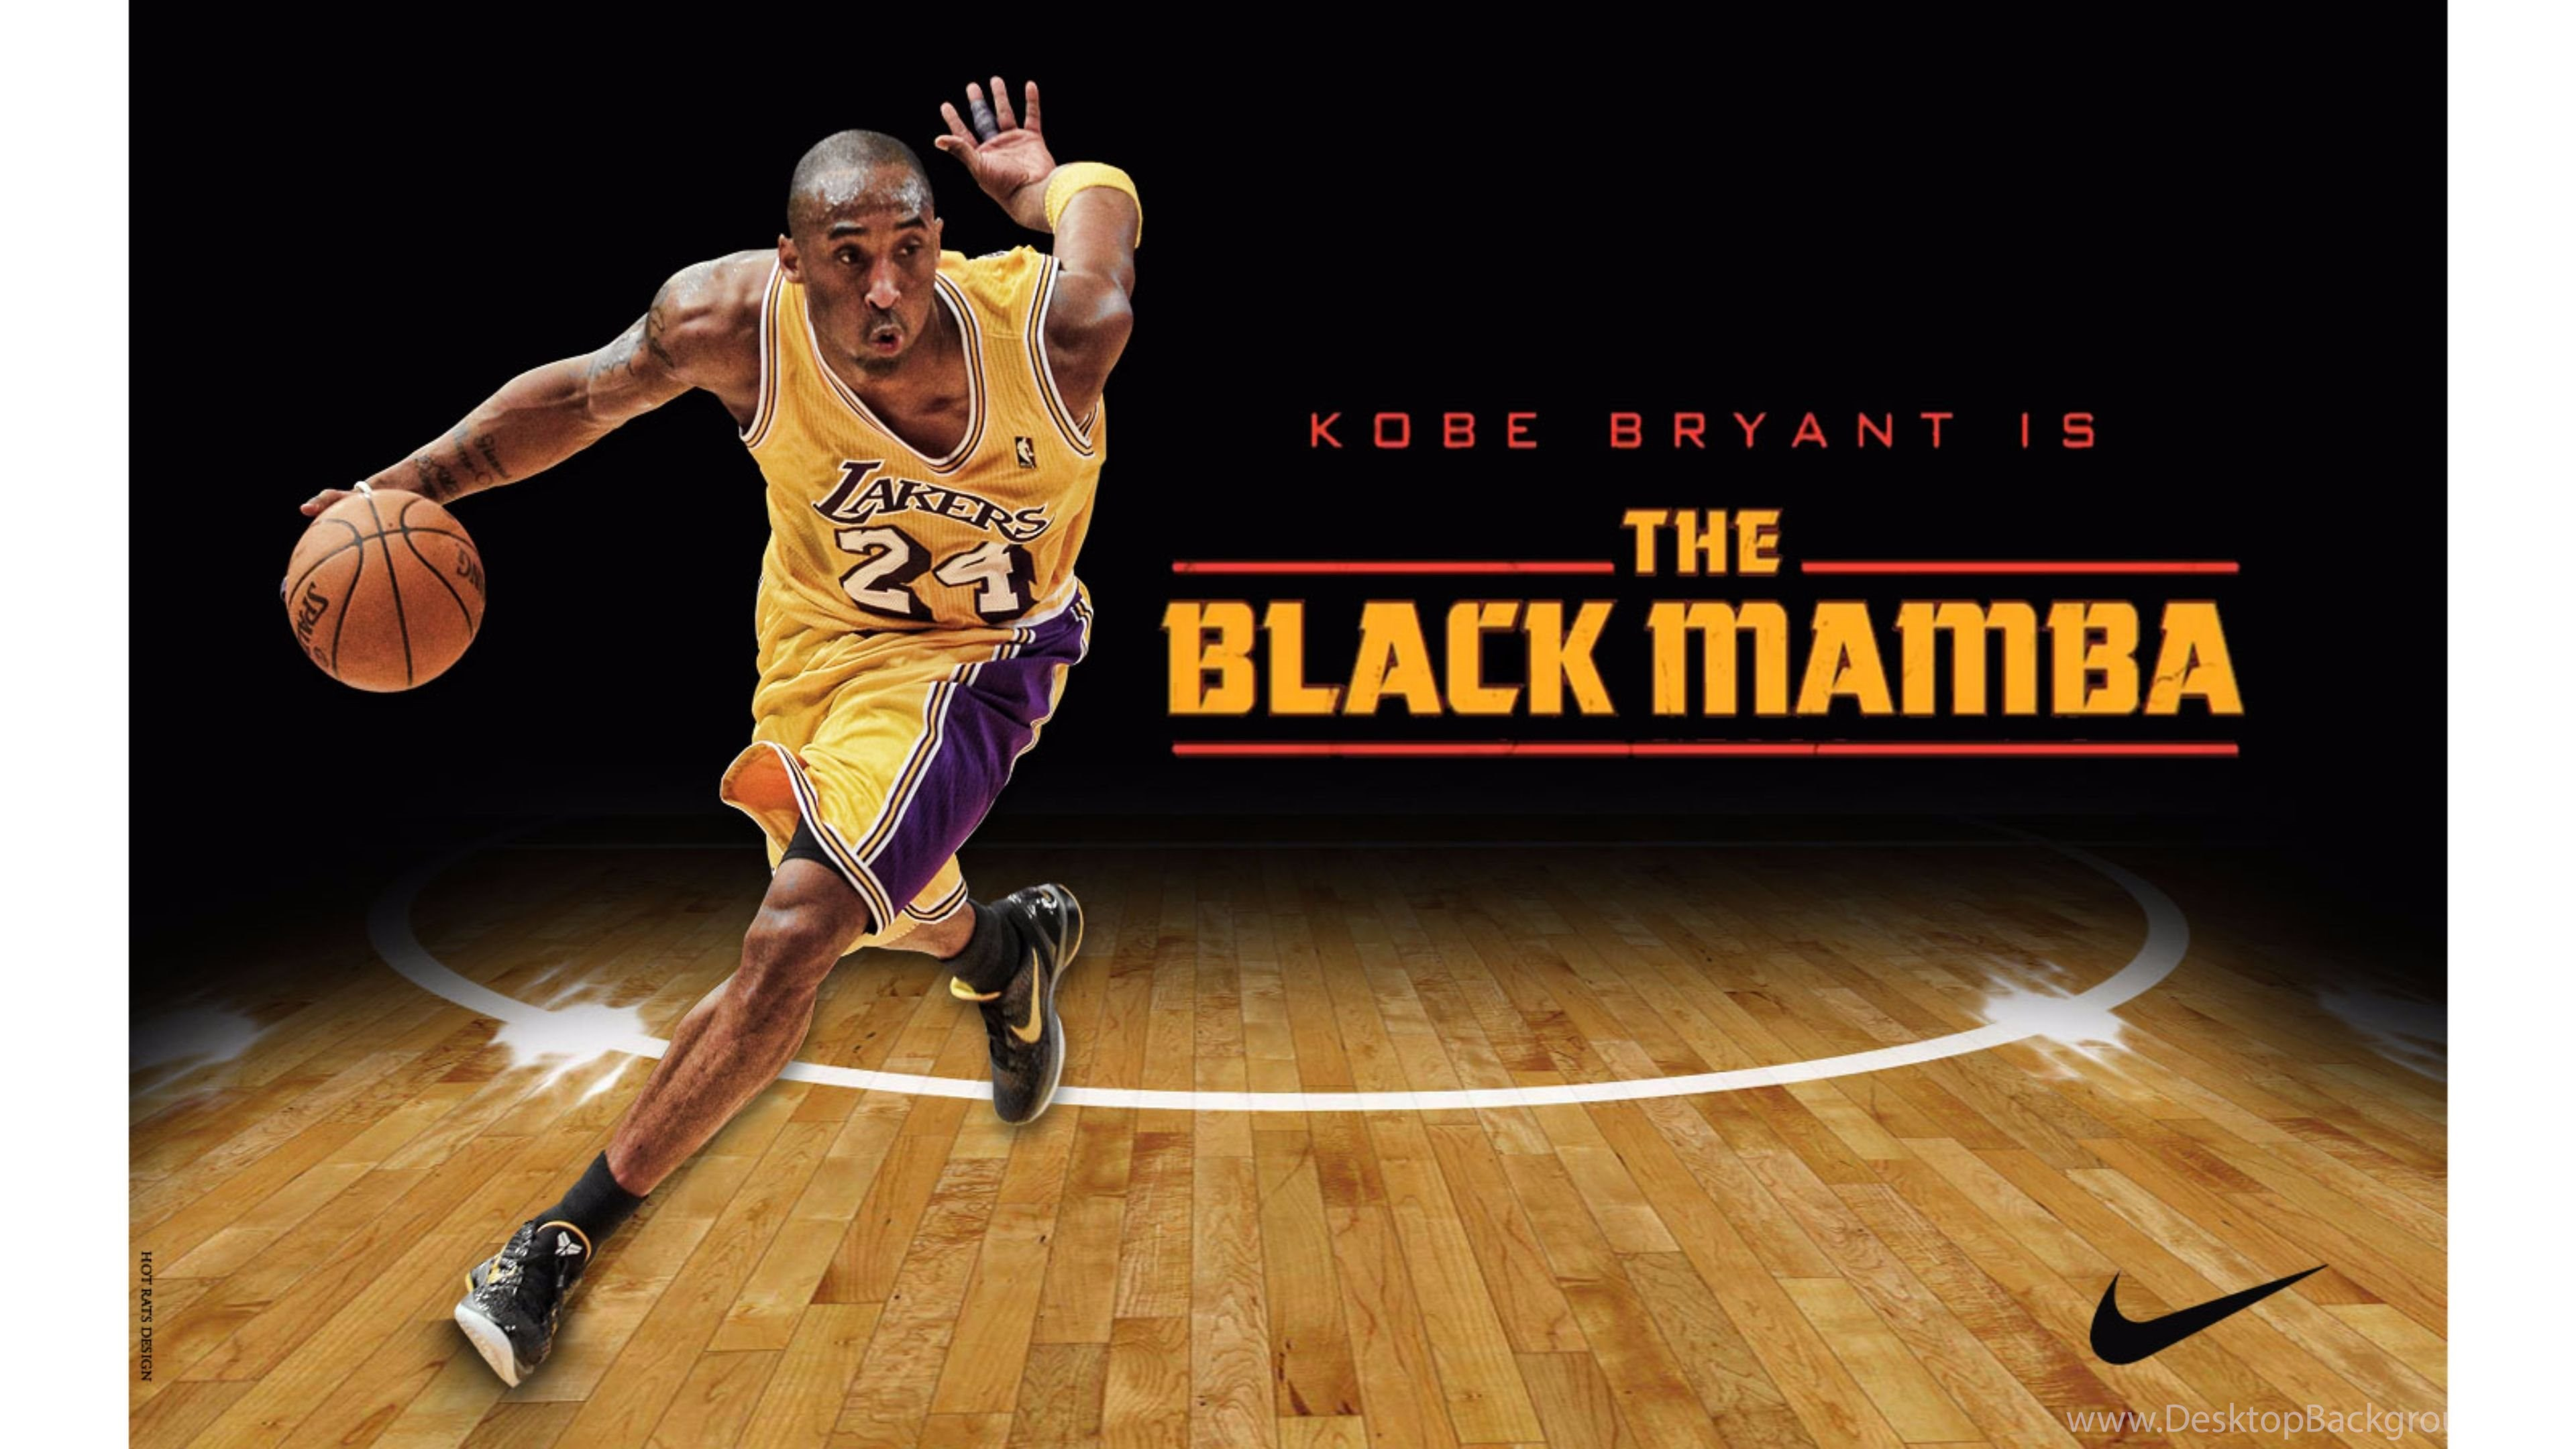 Lakers Kobe Black Mamba 2281353 Hd Wallpaper Backgrounds Download